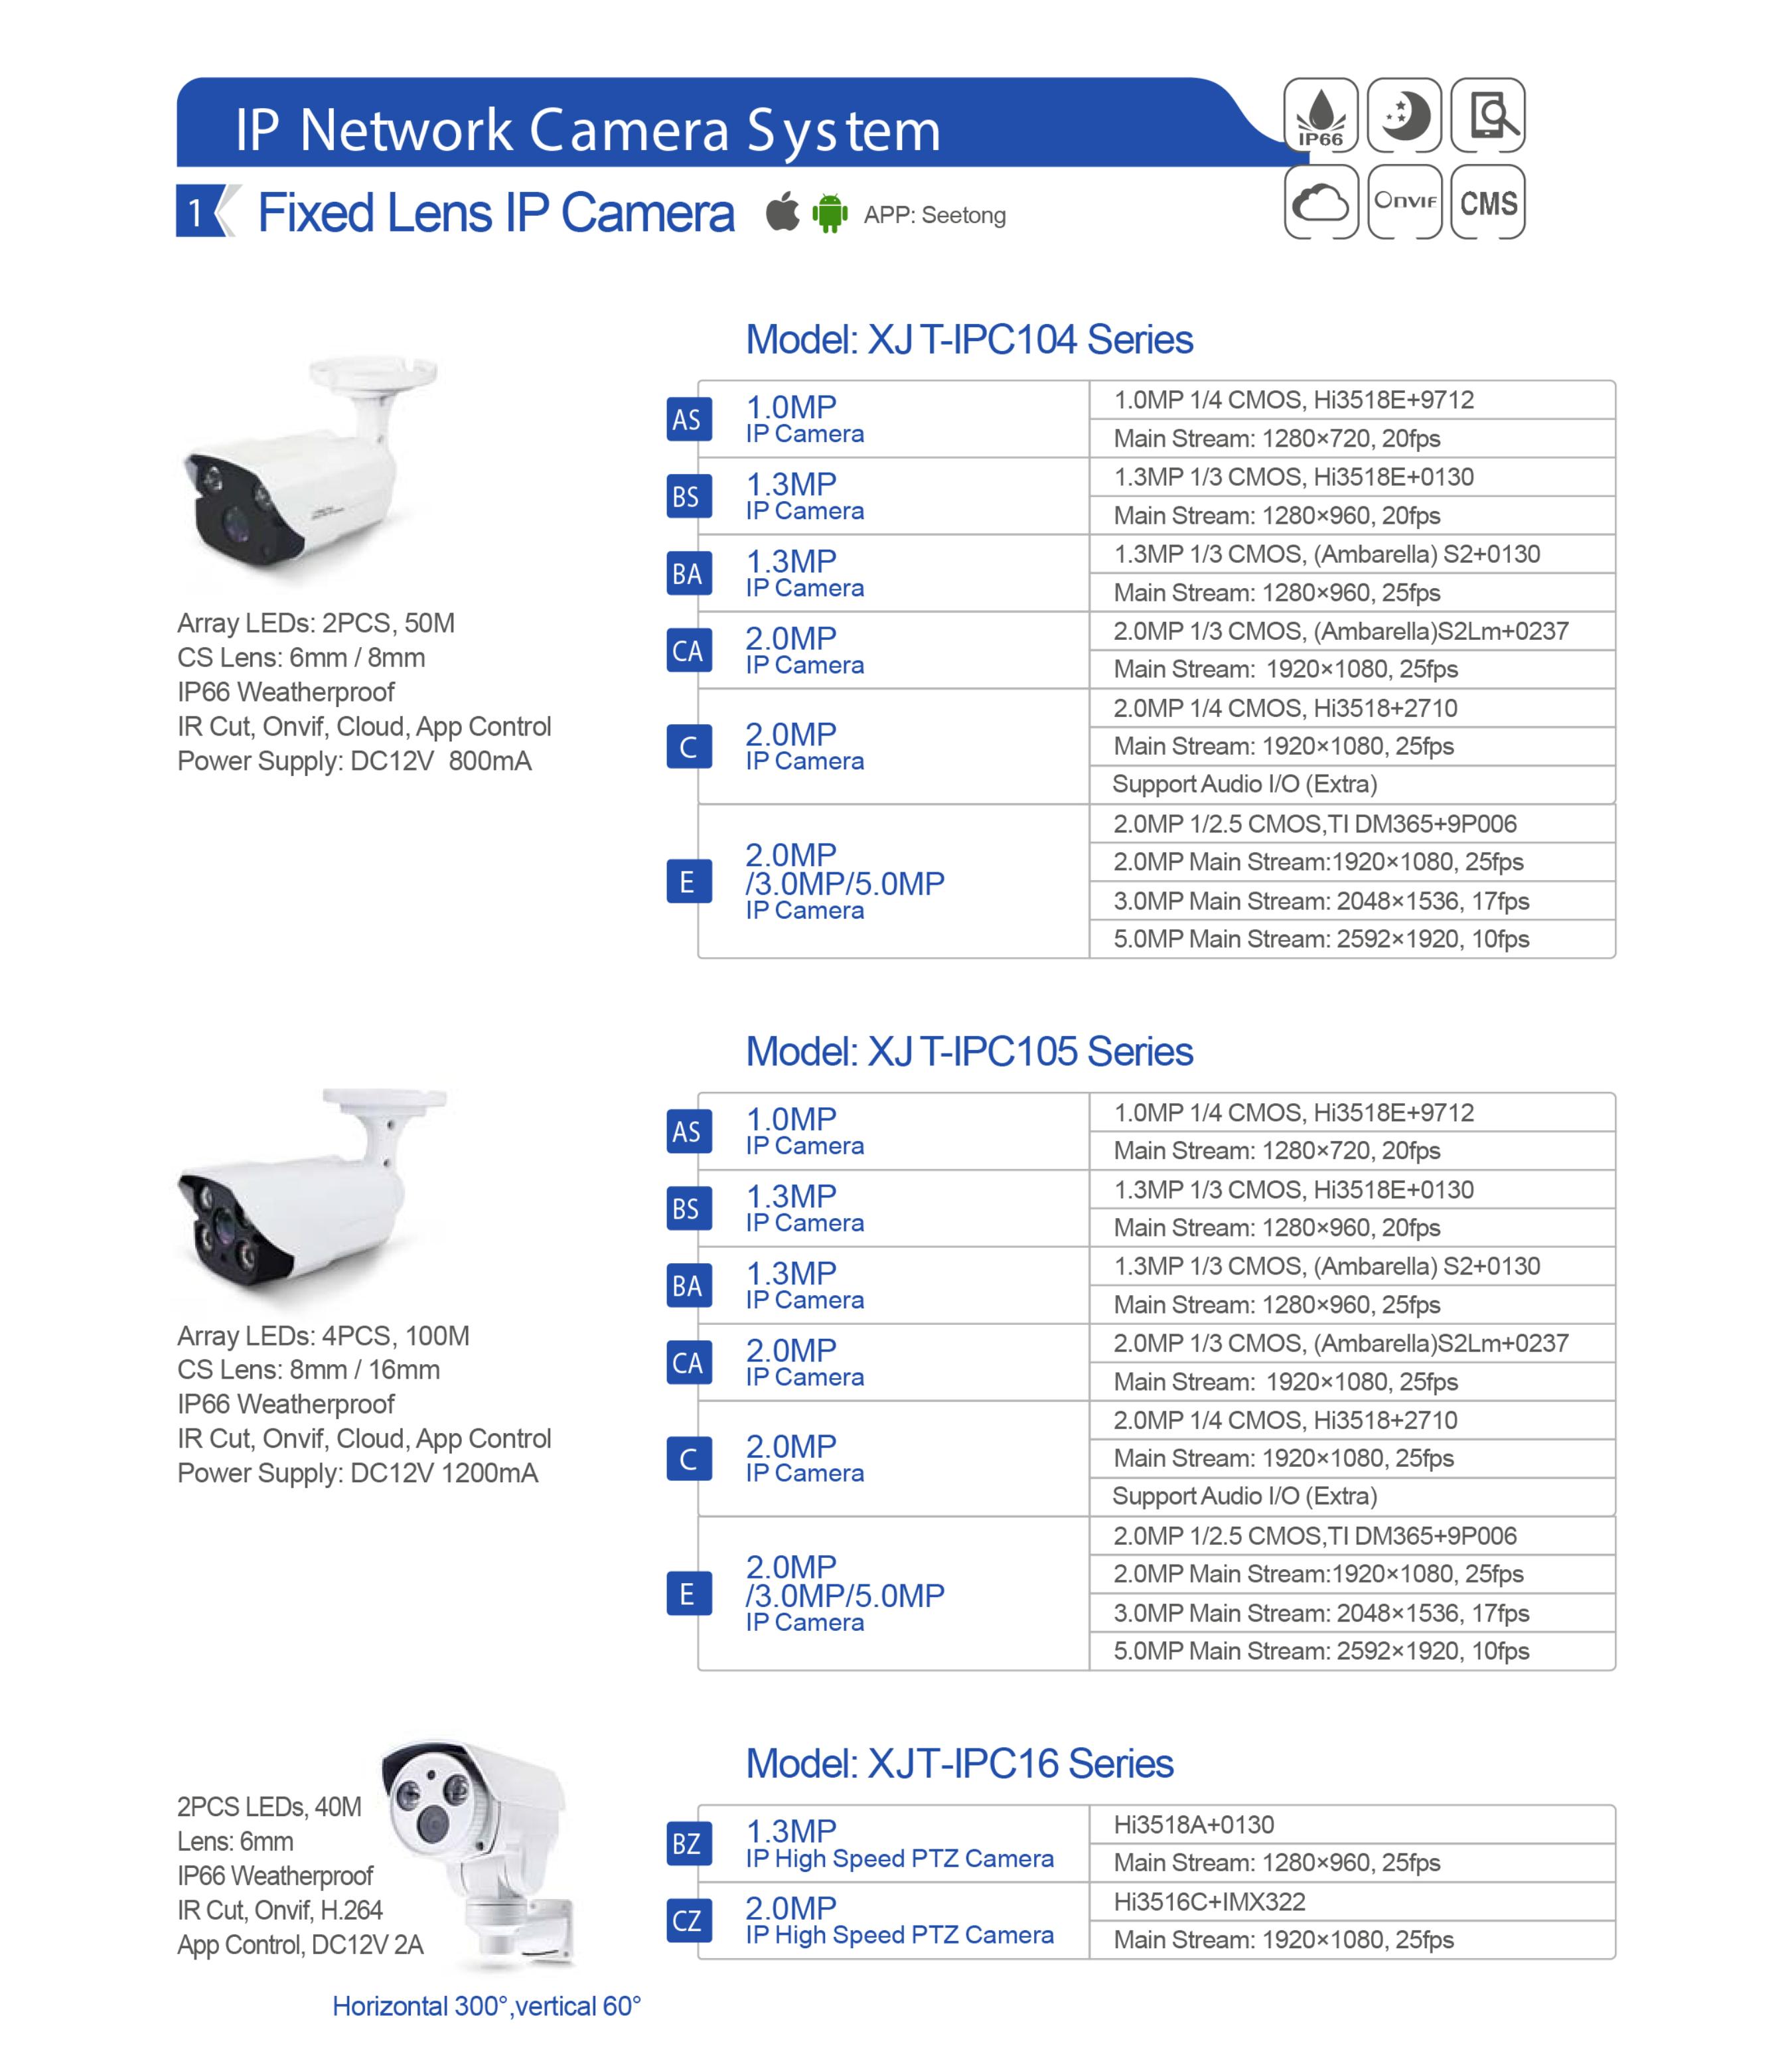 IP Network Camera System – XJ Trading LLC